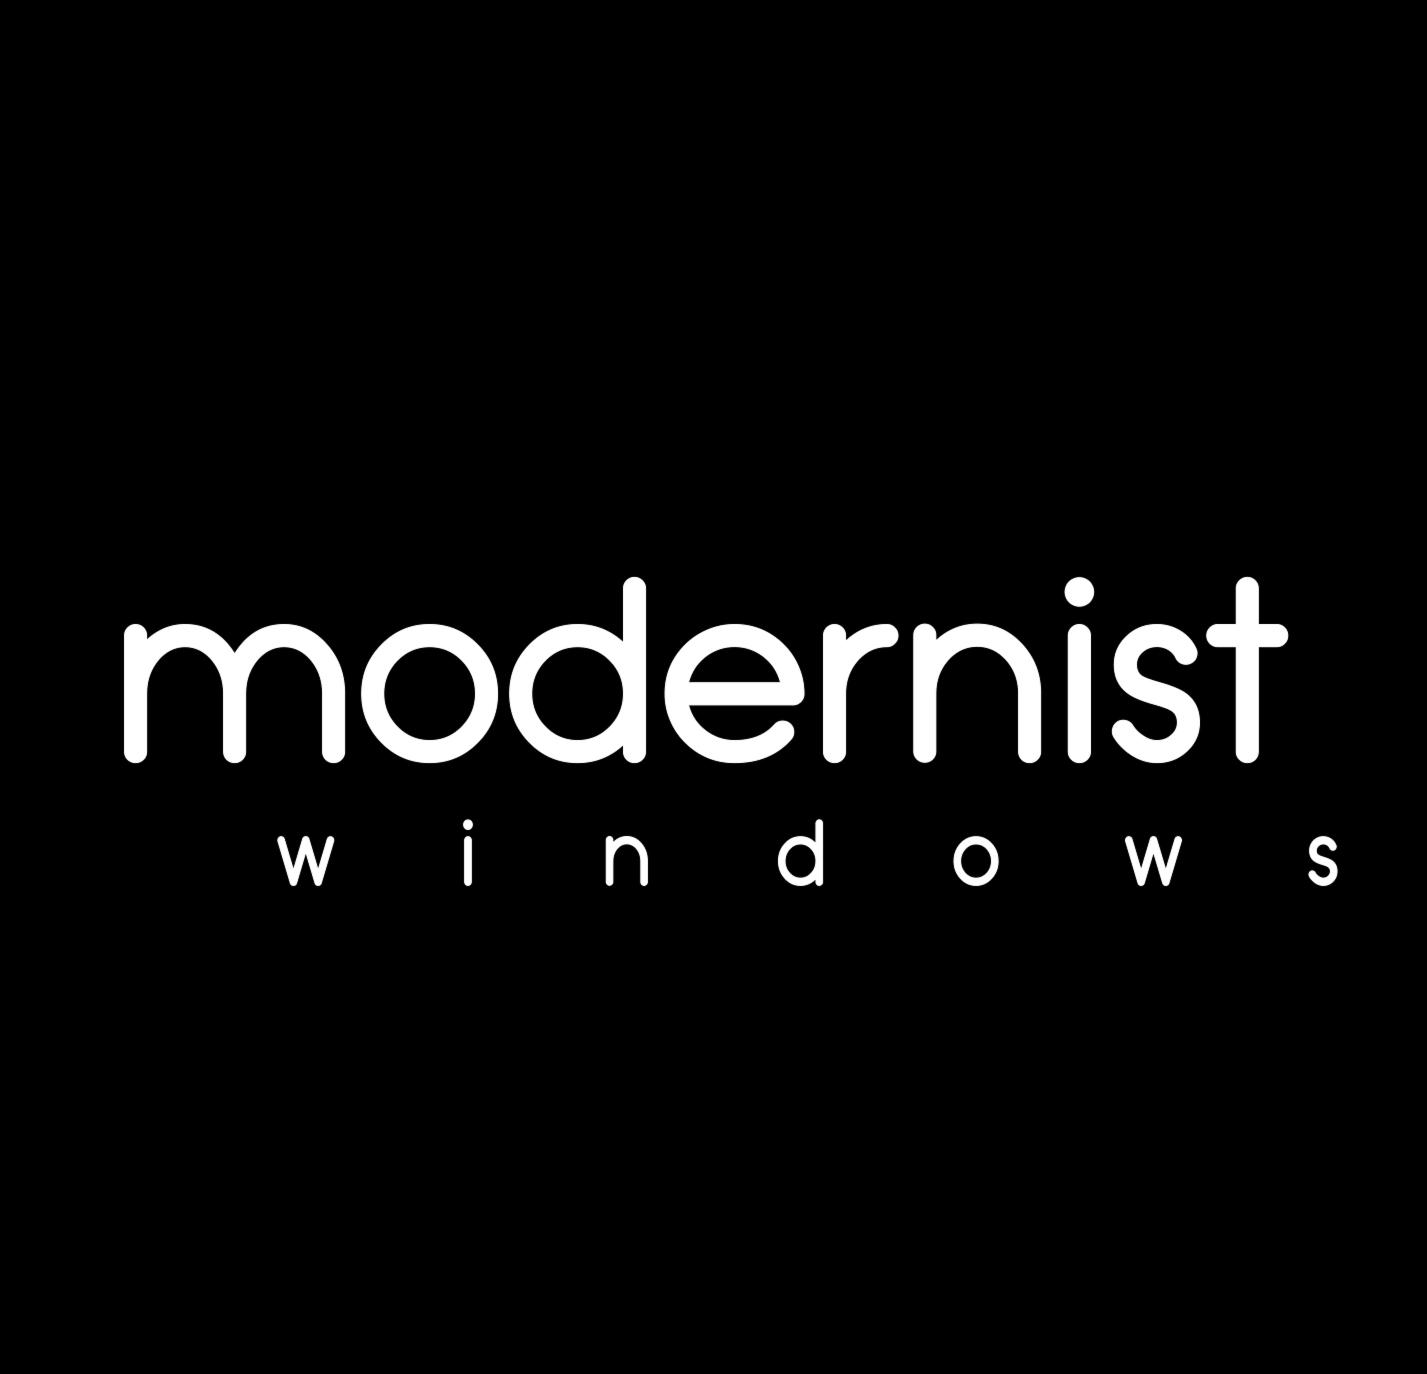 Modernist Windows